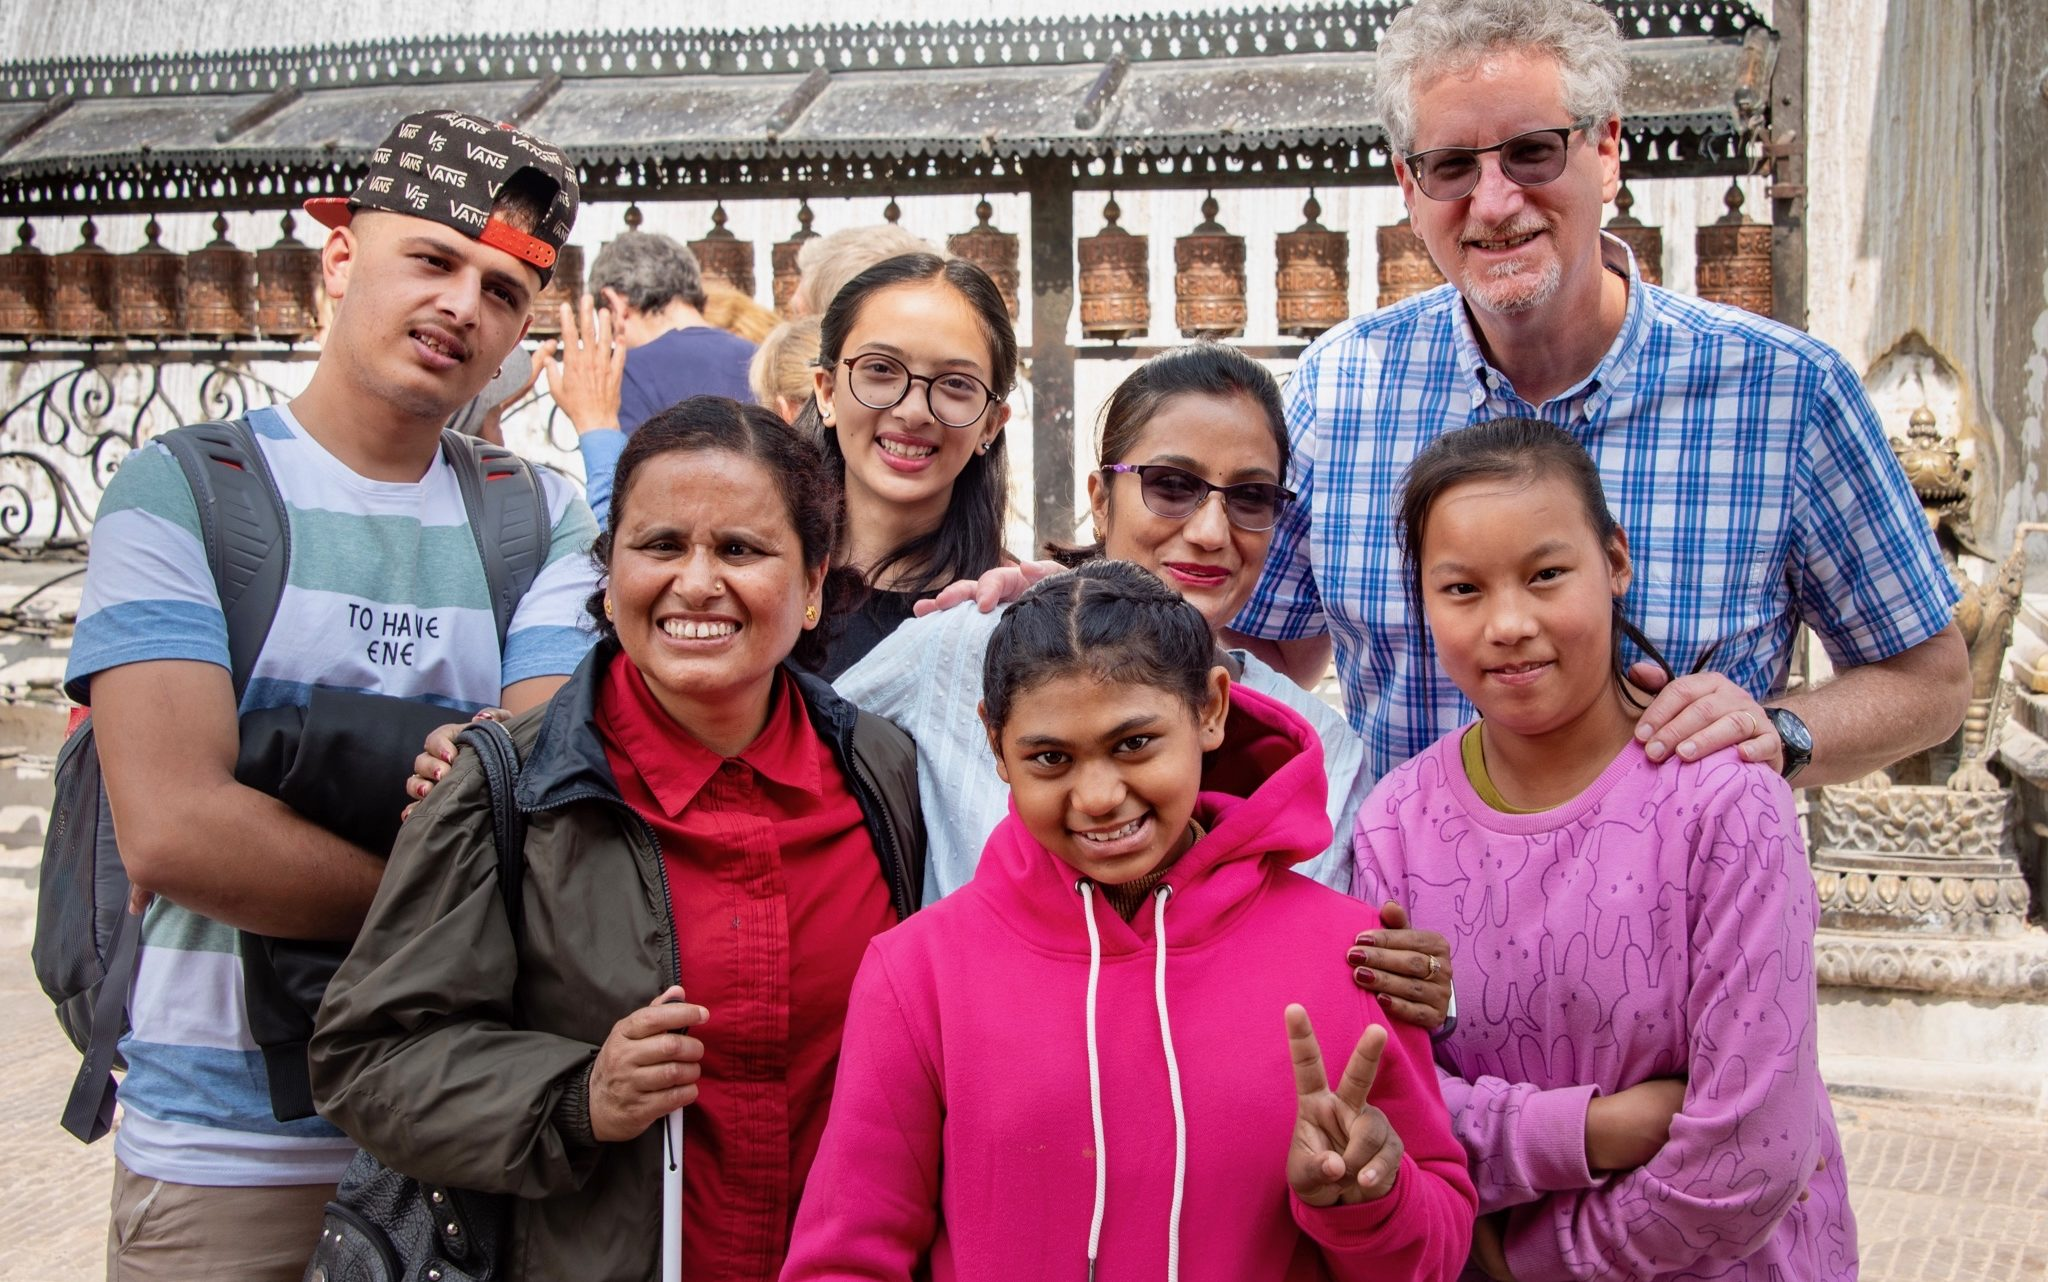 Robert Rose (top Right) visiting Nepal (Photo Credit: Armen Stein)